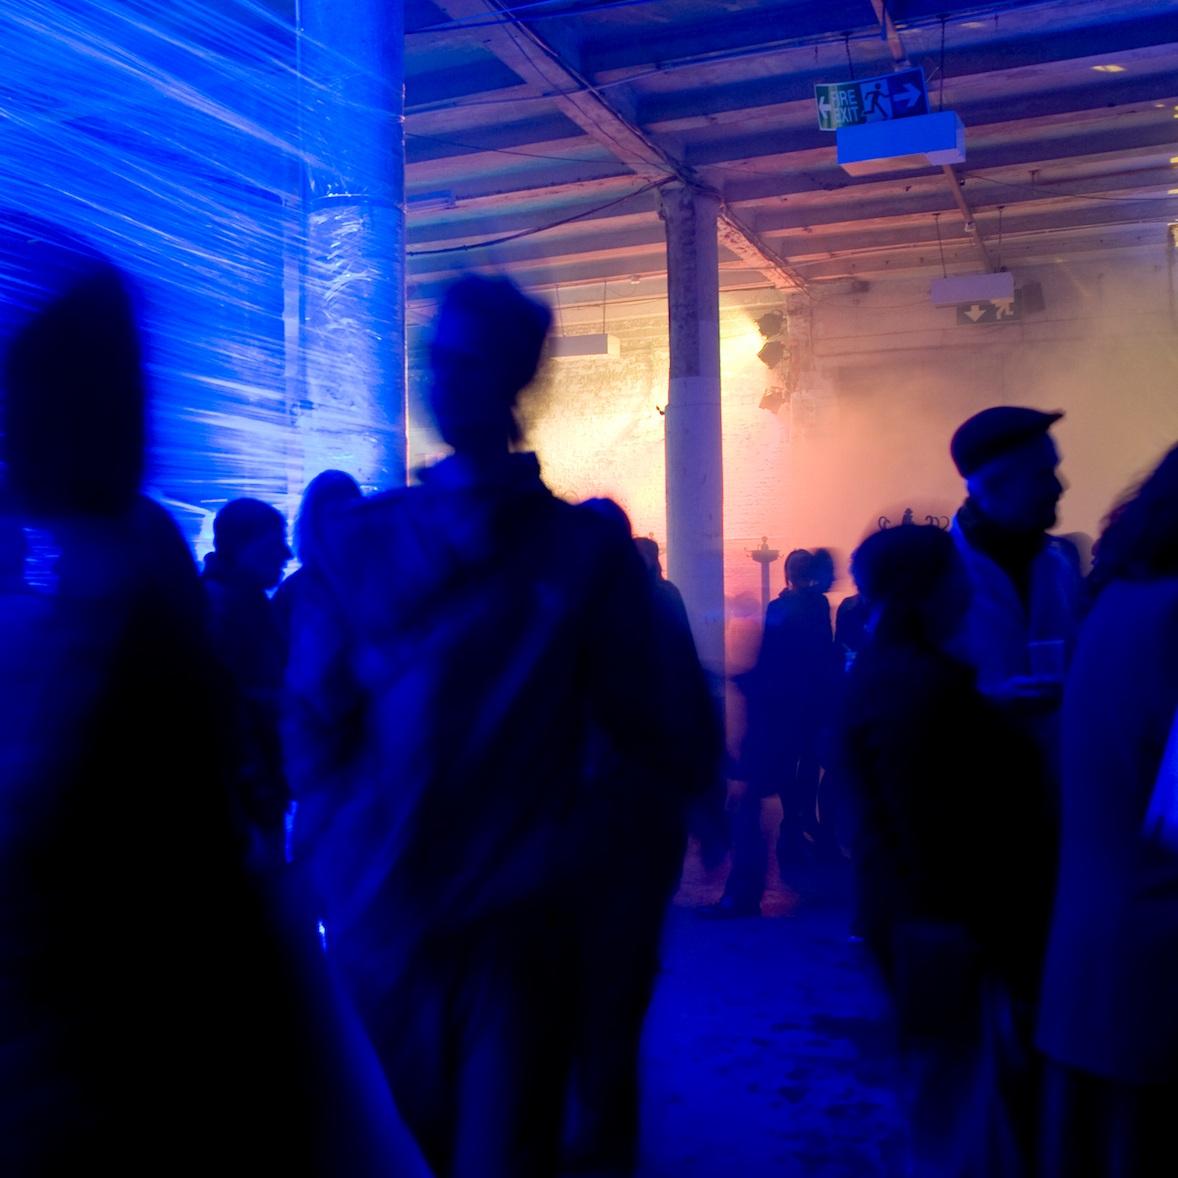 - liverpool biennial opening parties